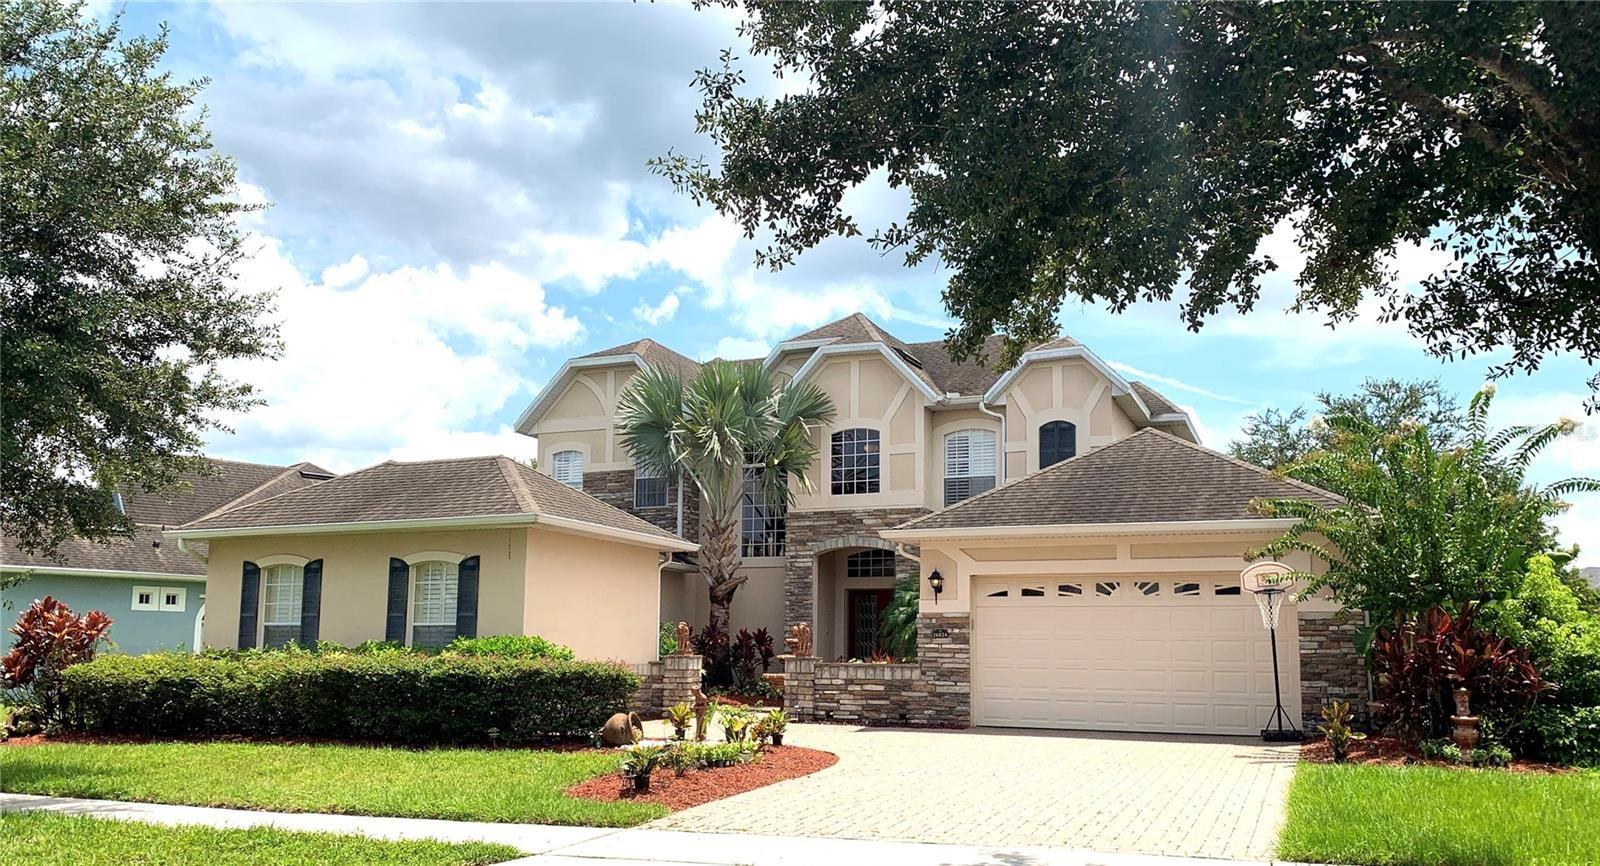 16024 BRISTOL LAKE CIRCLE, Orlando, FL 32828 - #: O5962781